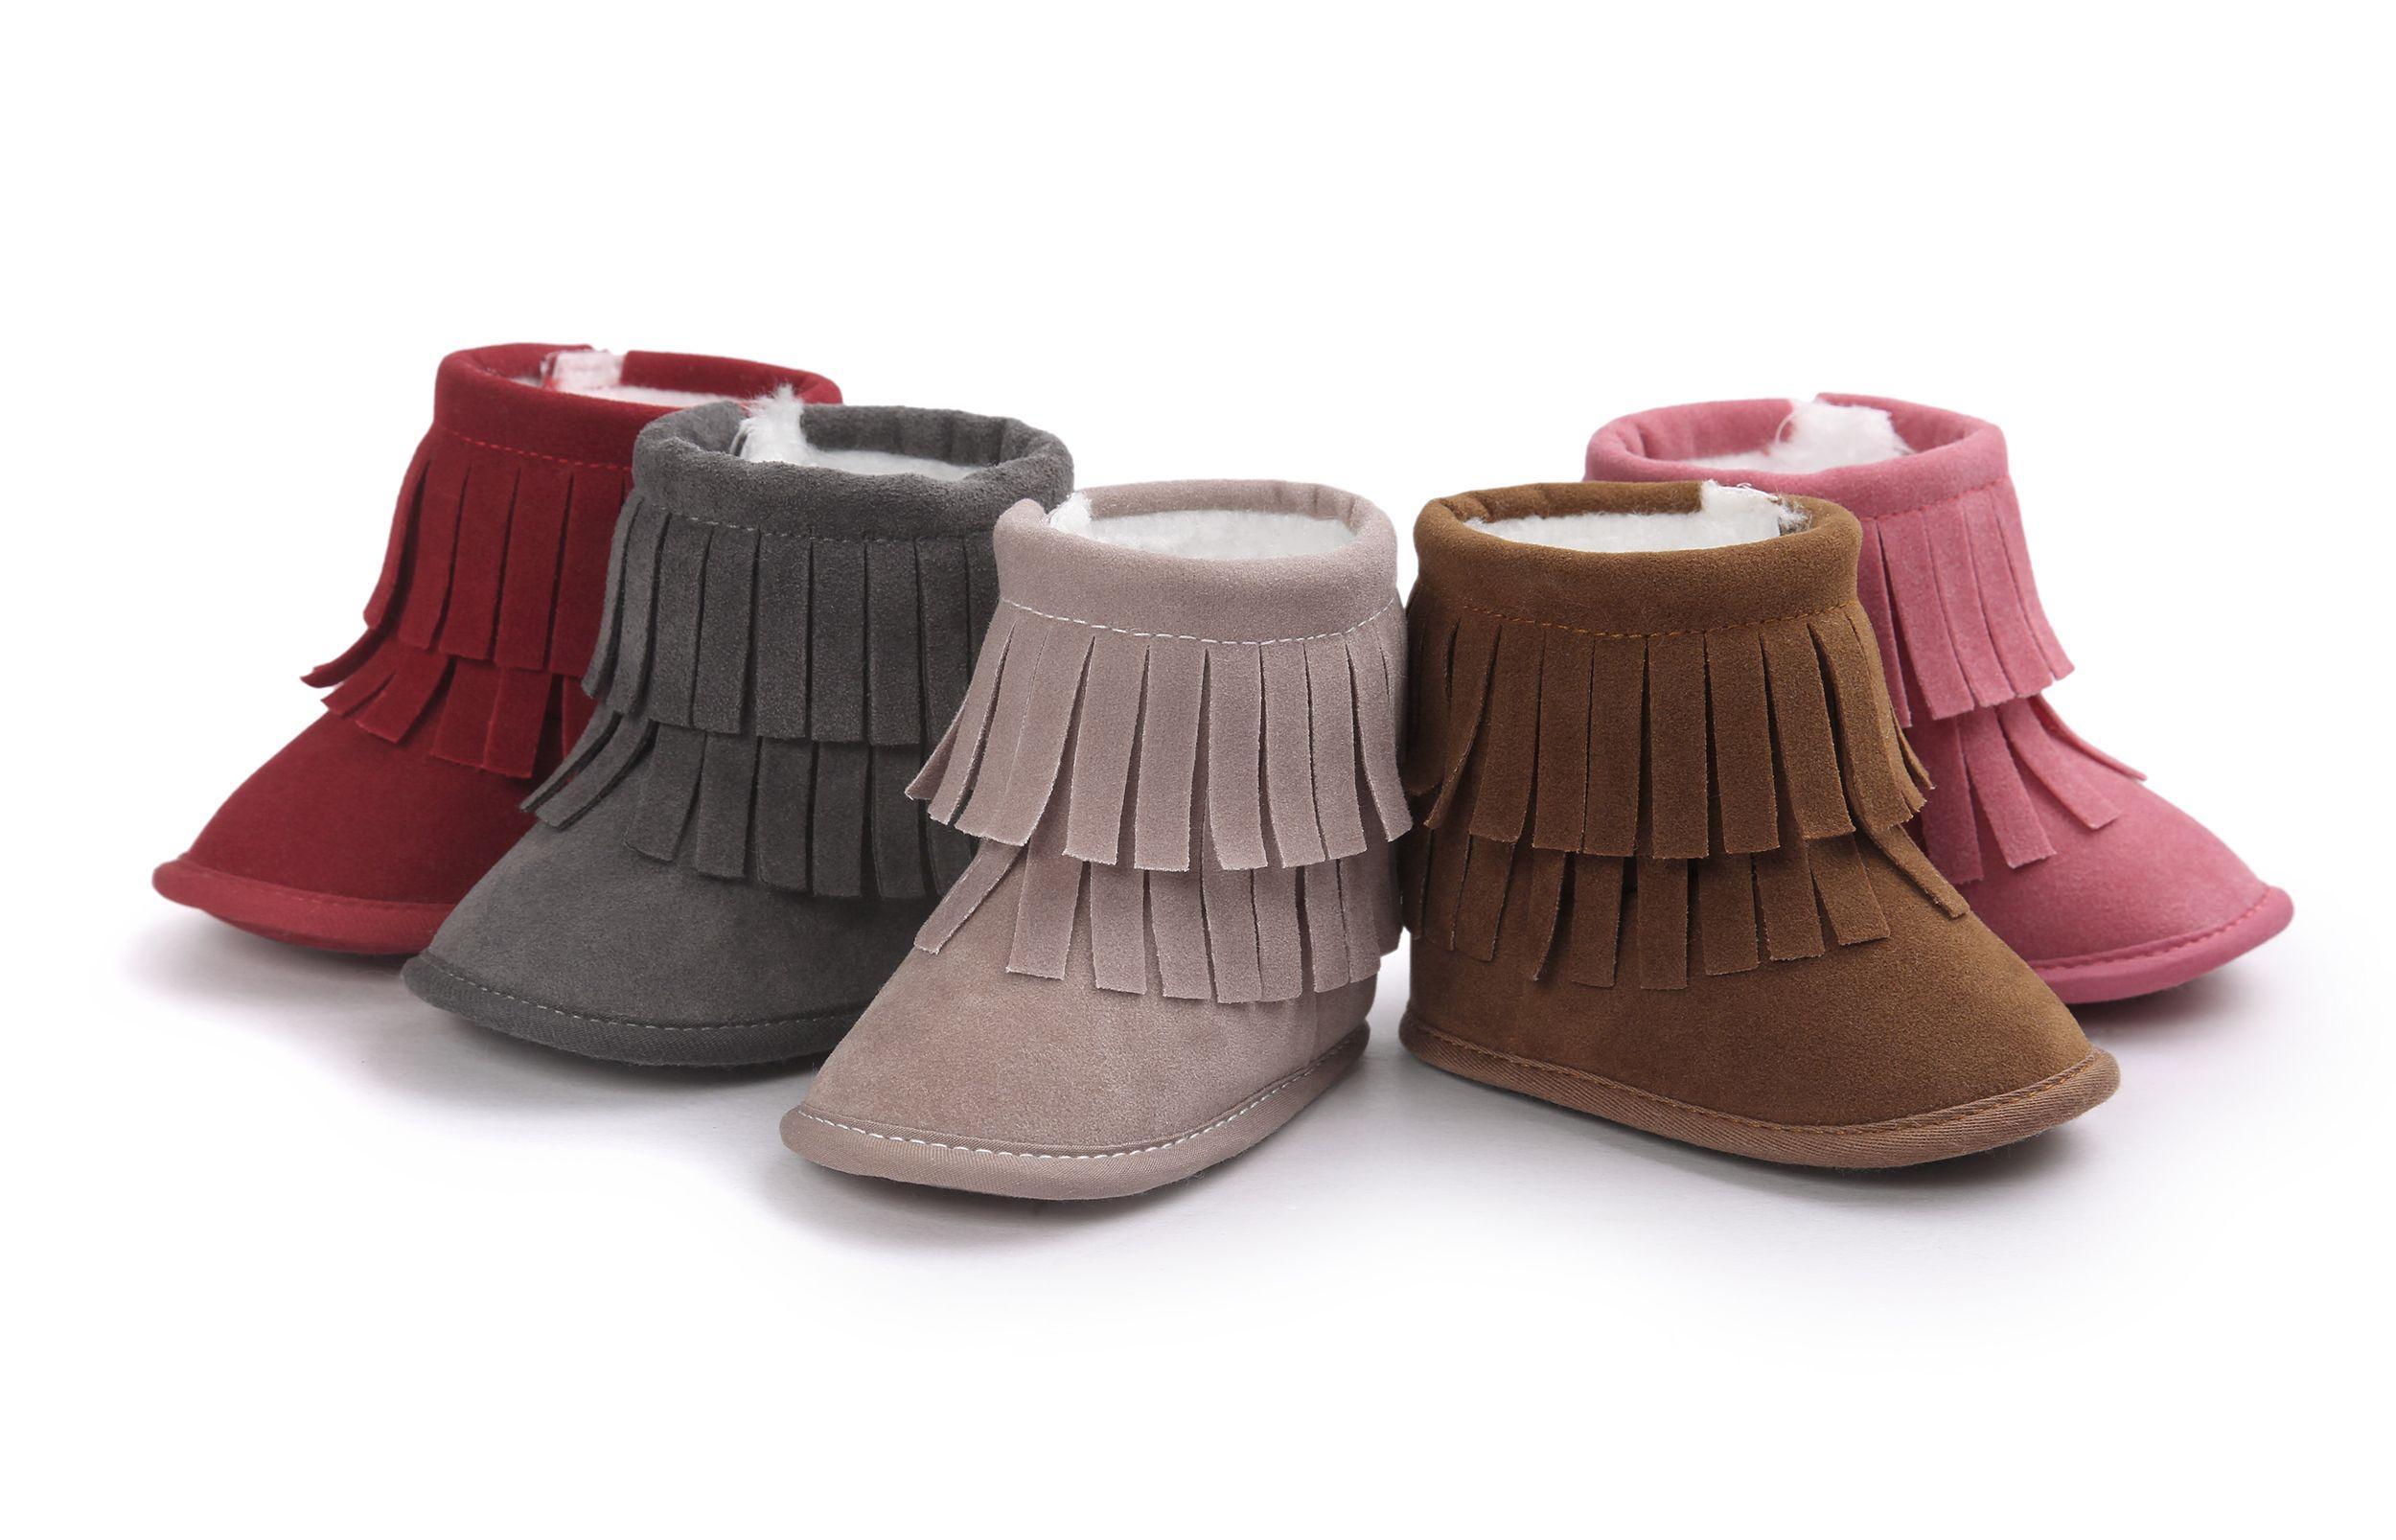 Fashion Tassel Design Infant Boots Winter Baby Girls boys Shoes